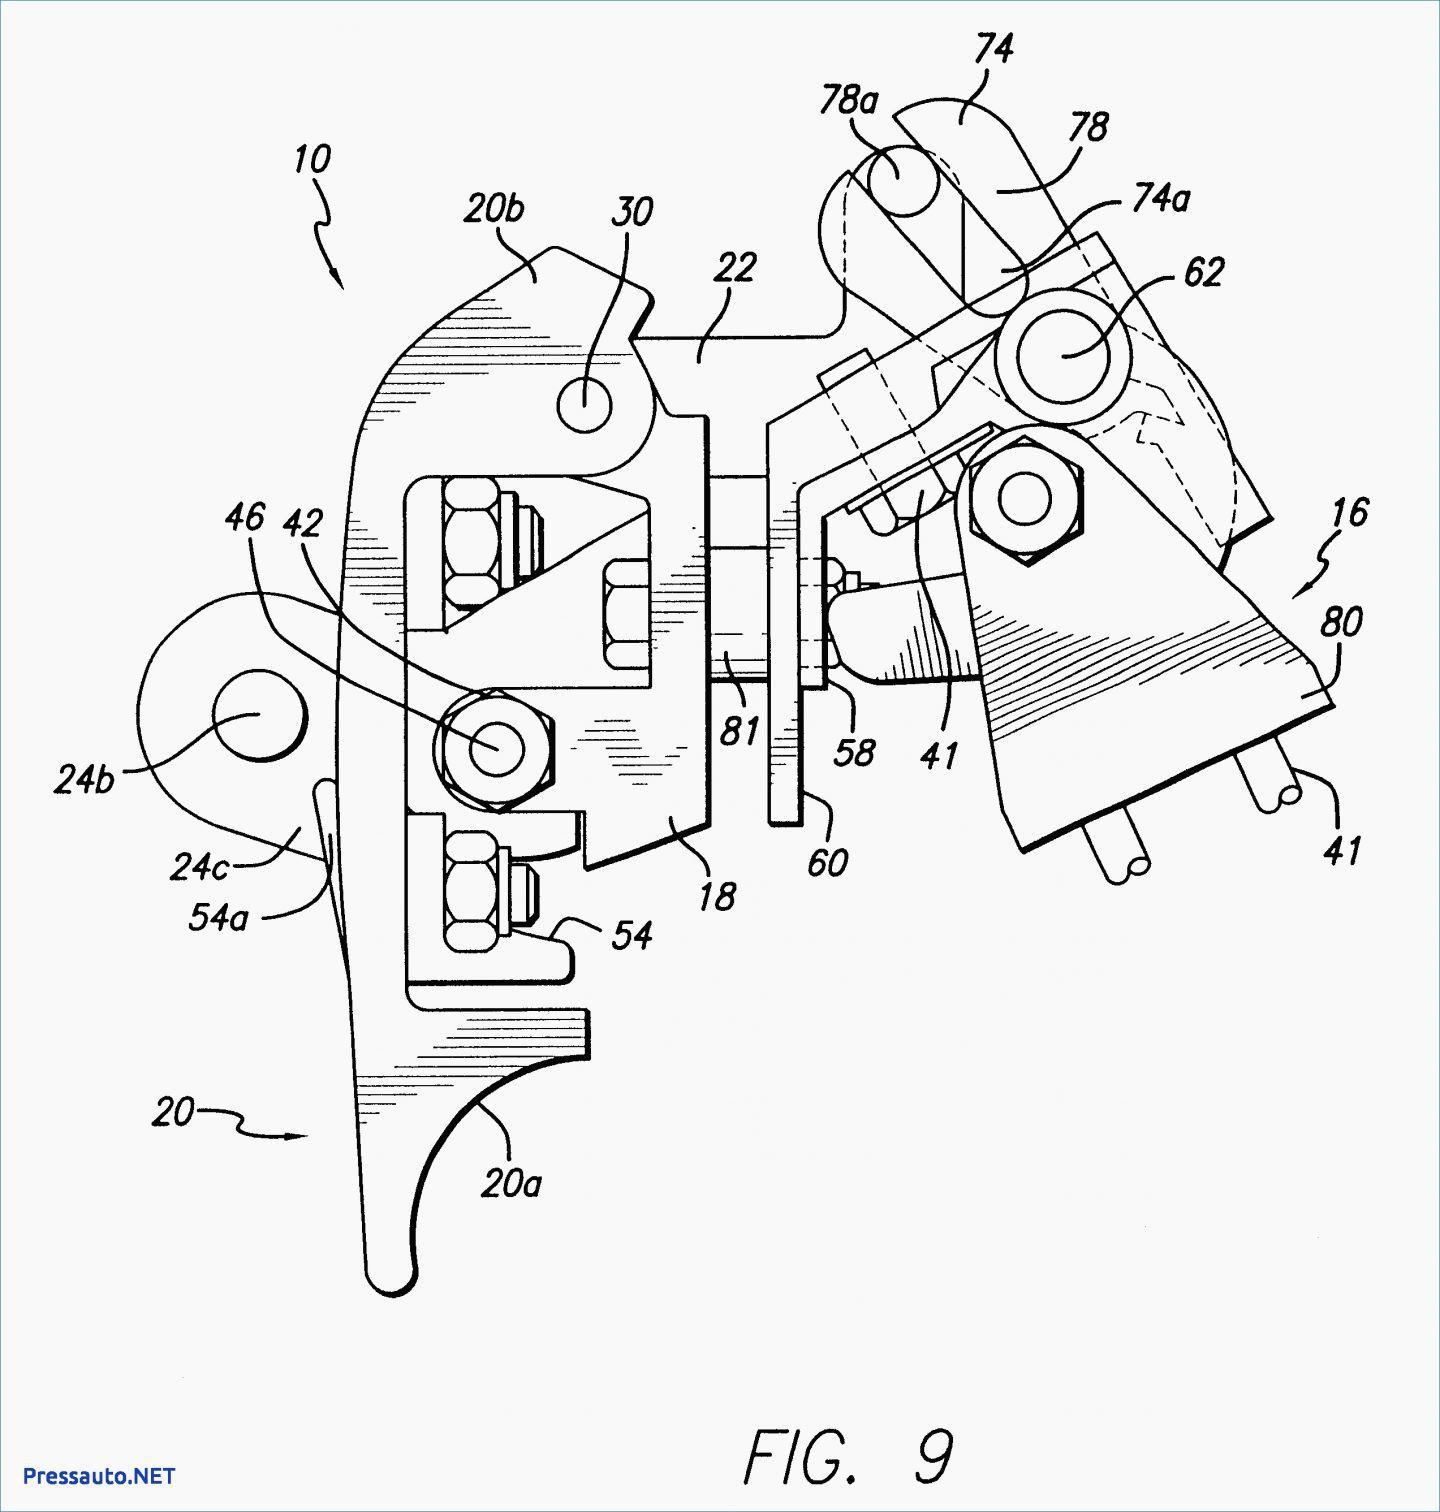 30 Amp Rv Plug Wiring Diagram New Hubbell Twist Lock Wiring Diagram - 30 Amp Twist Lock Plug Wiring Diagram